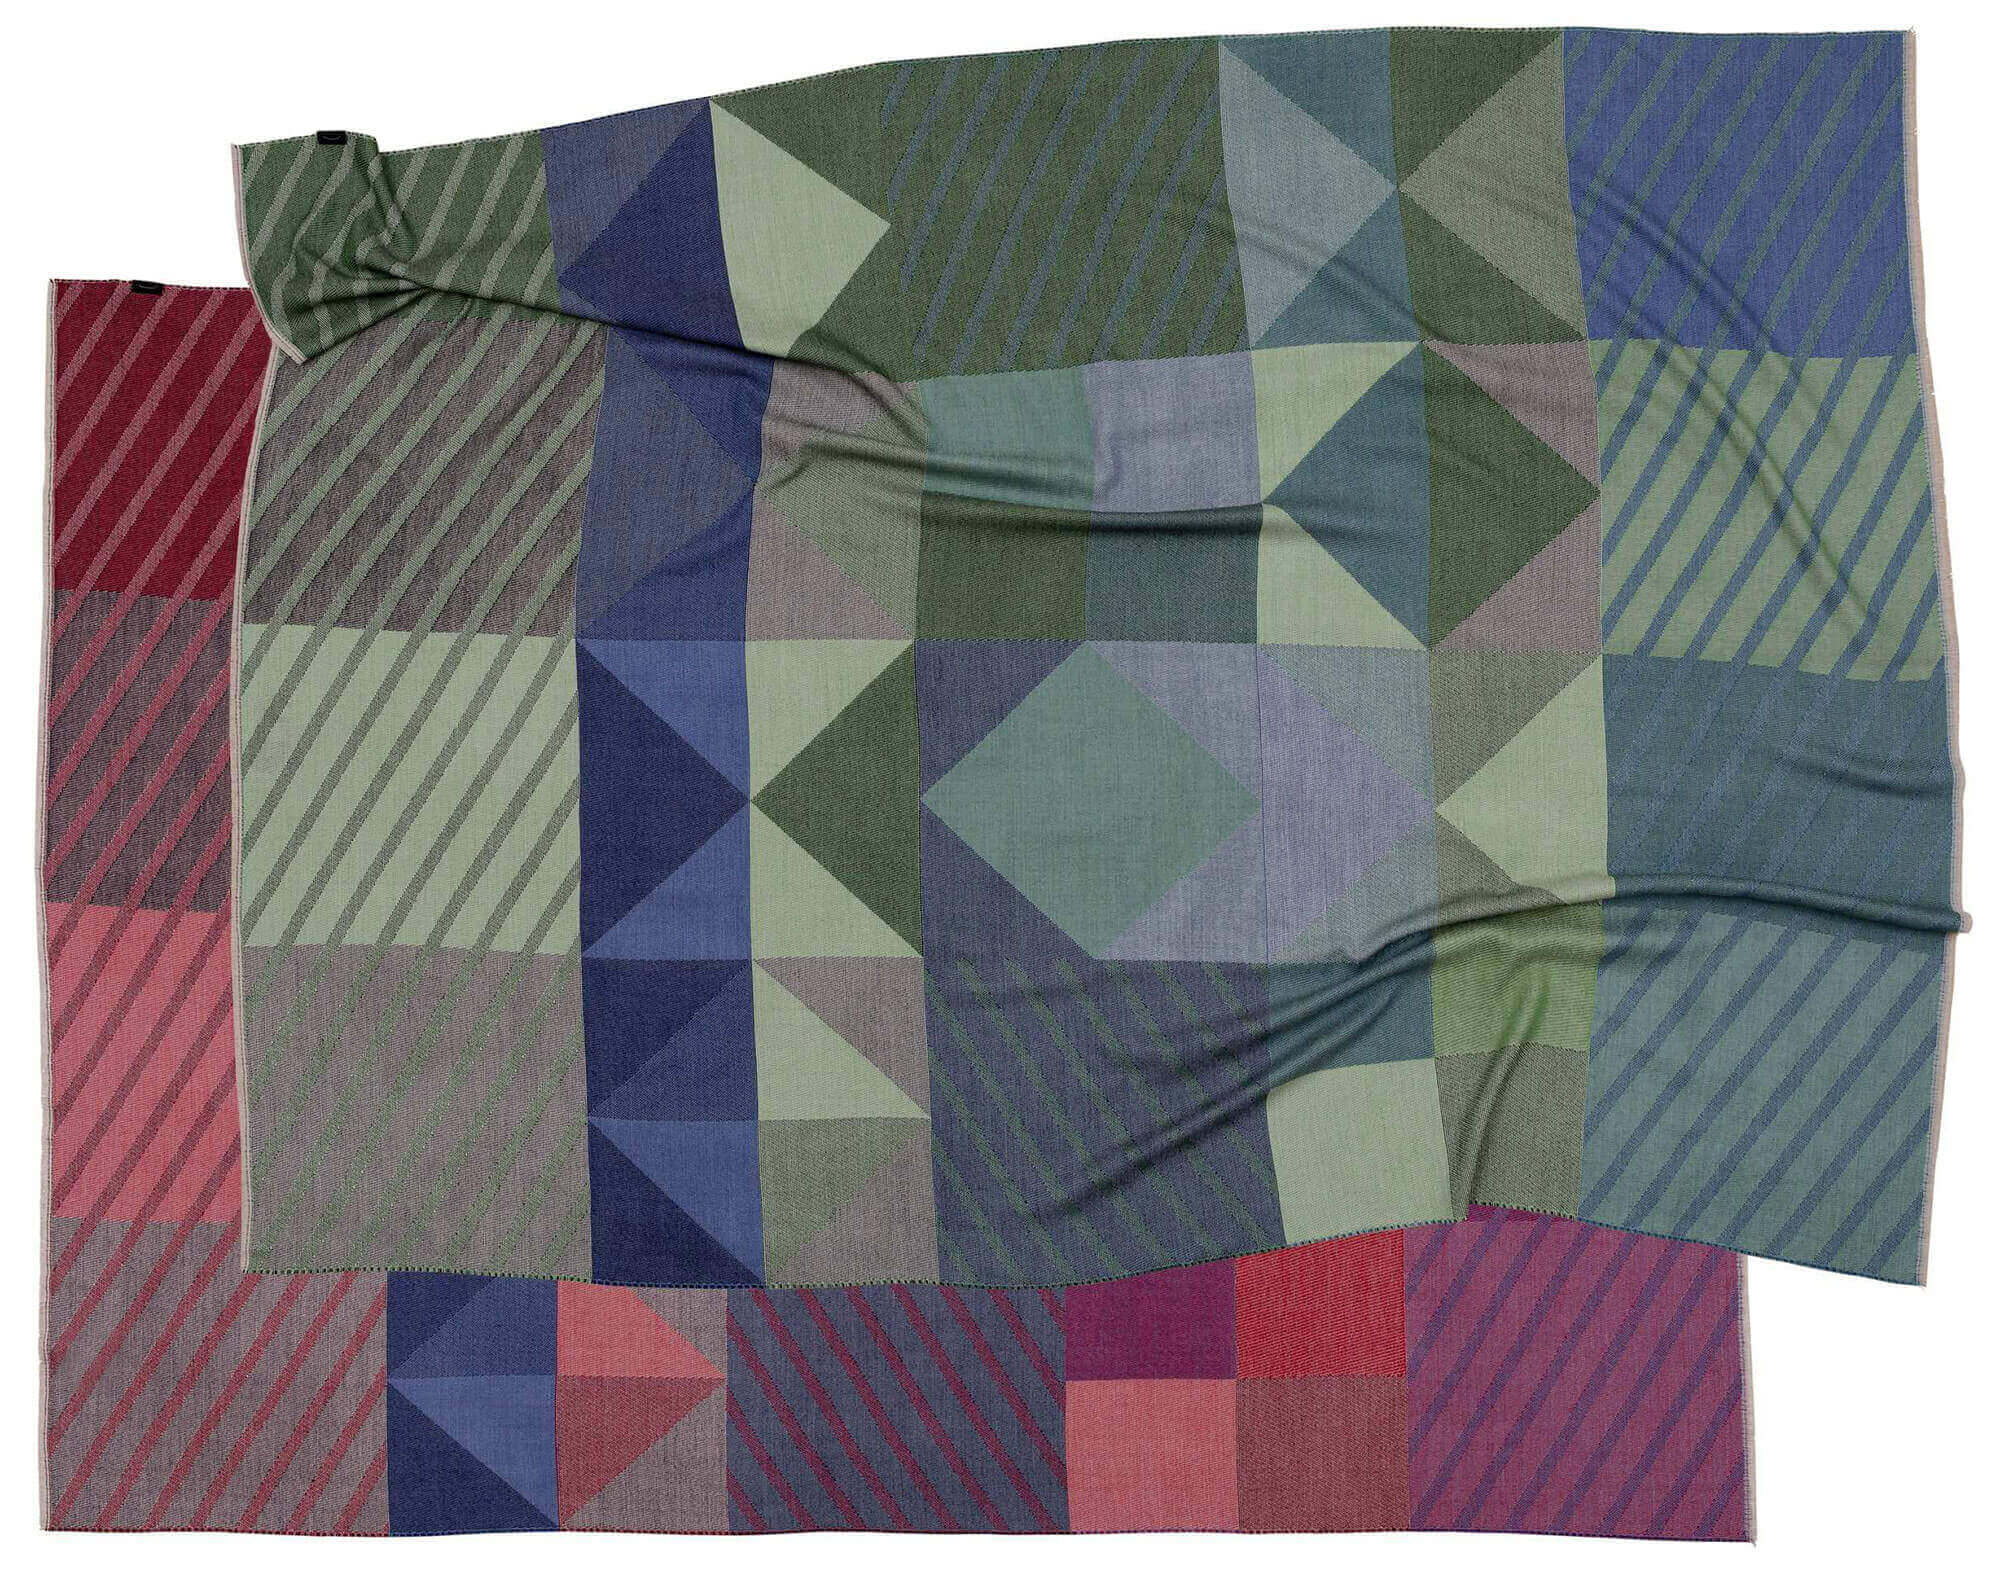 TeuberKohlhoff_Rhombus_blanket_Fotos_stefanhaehnel-blue-red-Mag-jpgRka9lqzGMPRVi_an